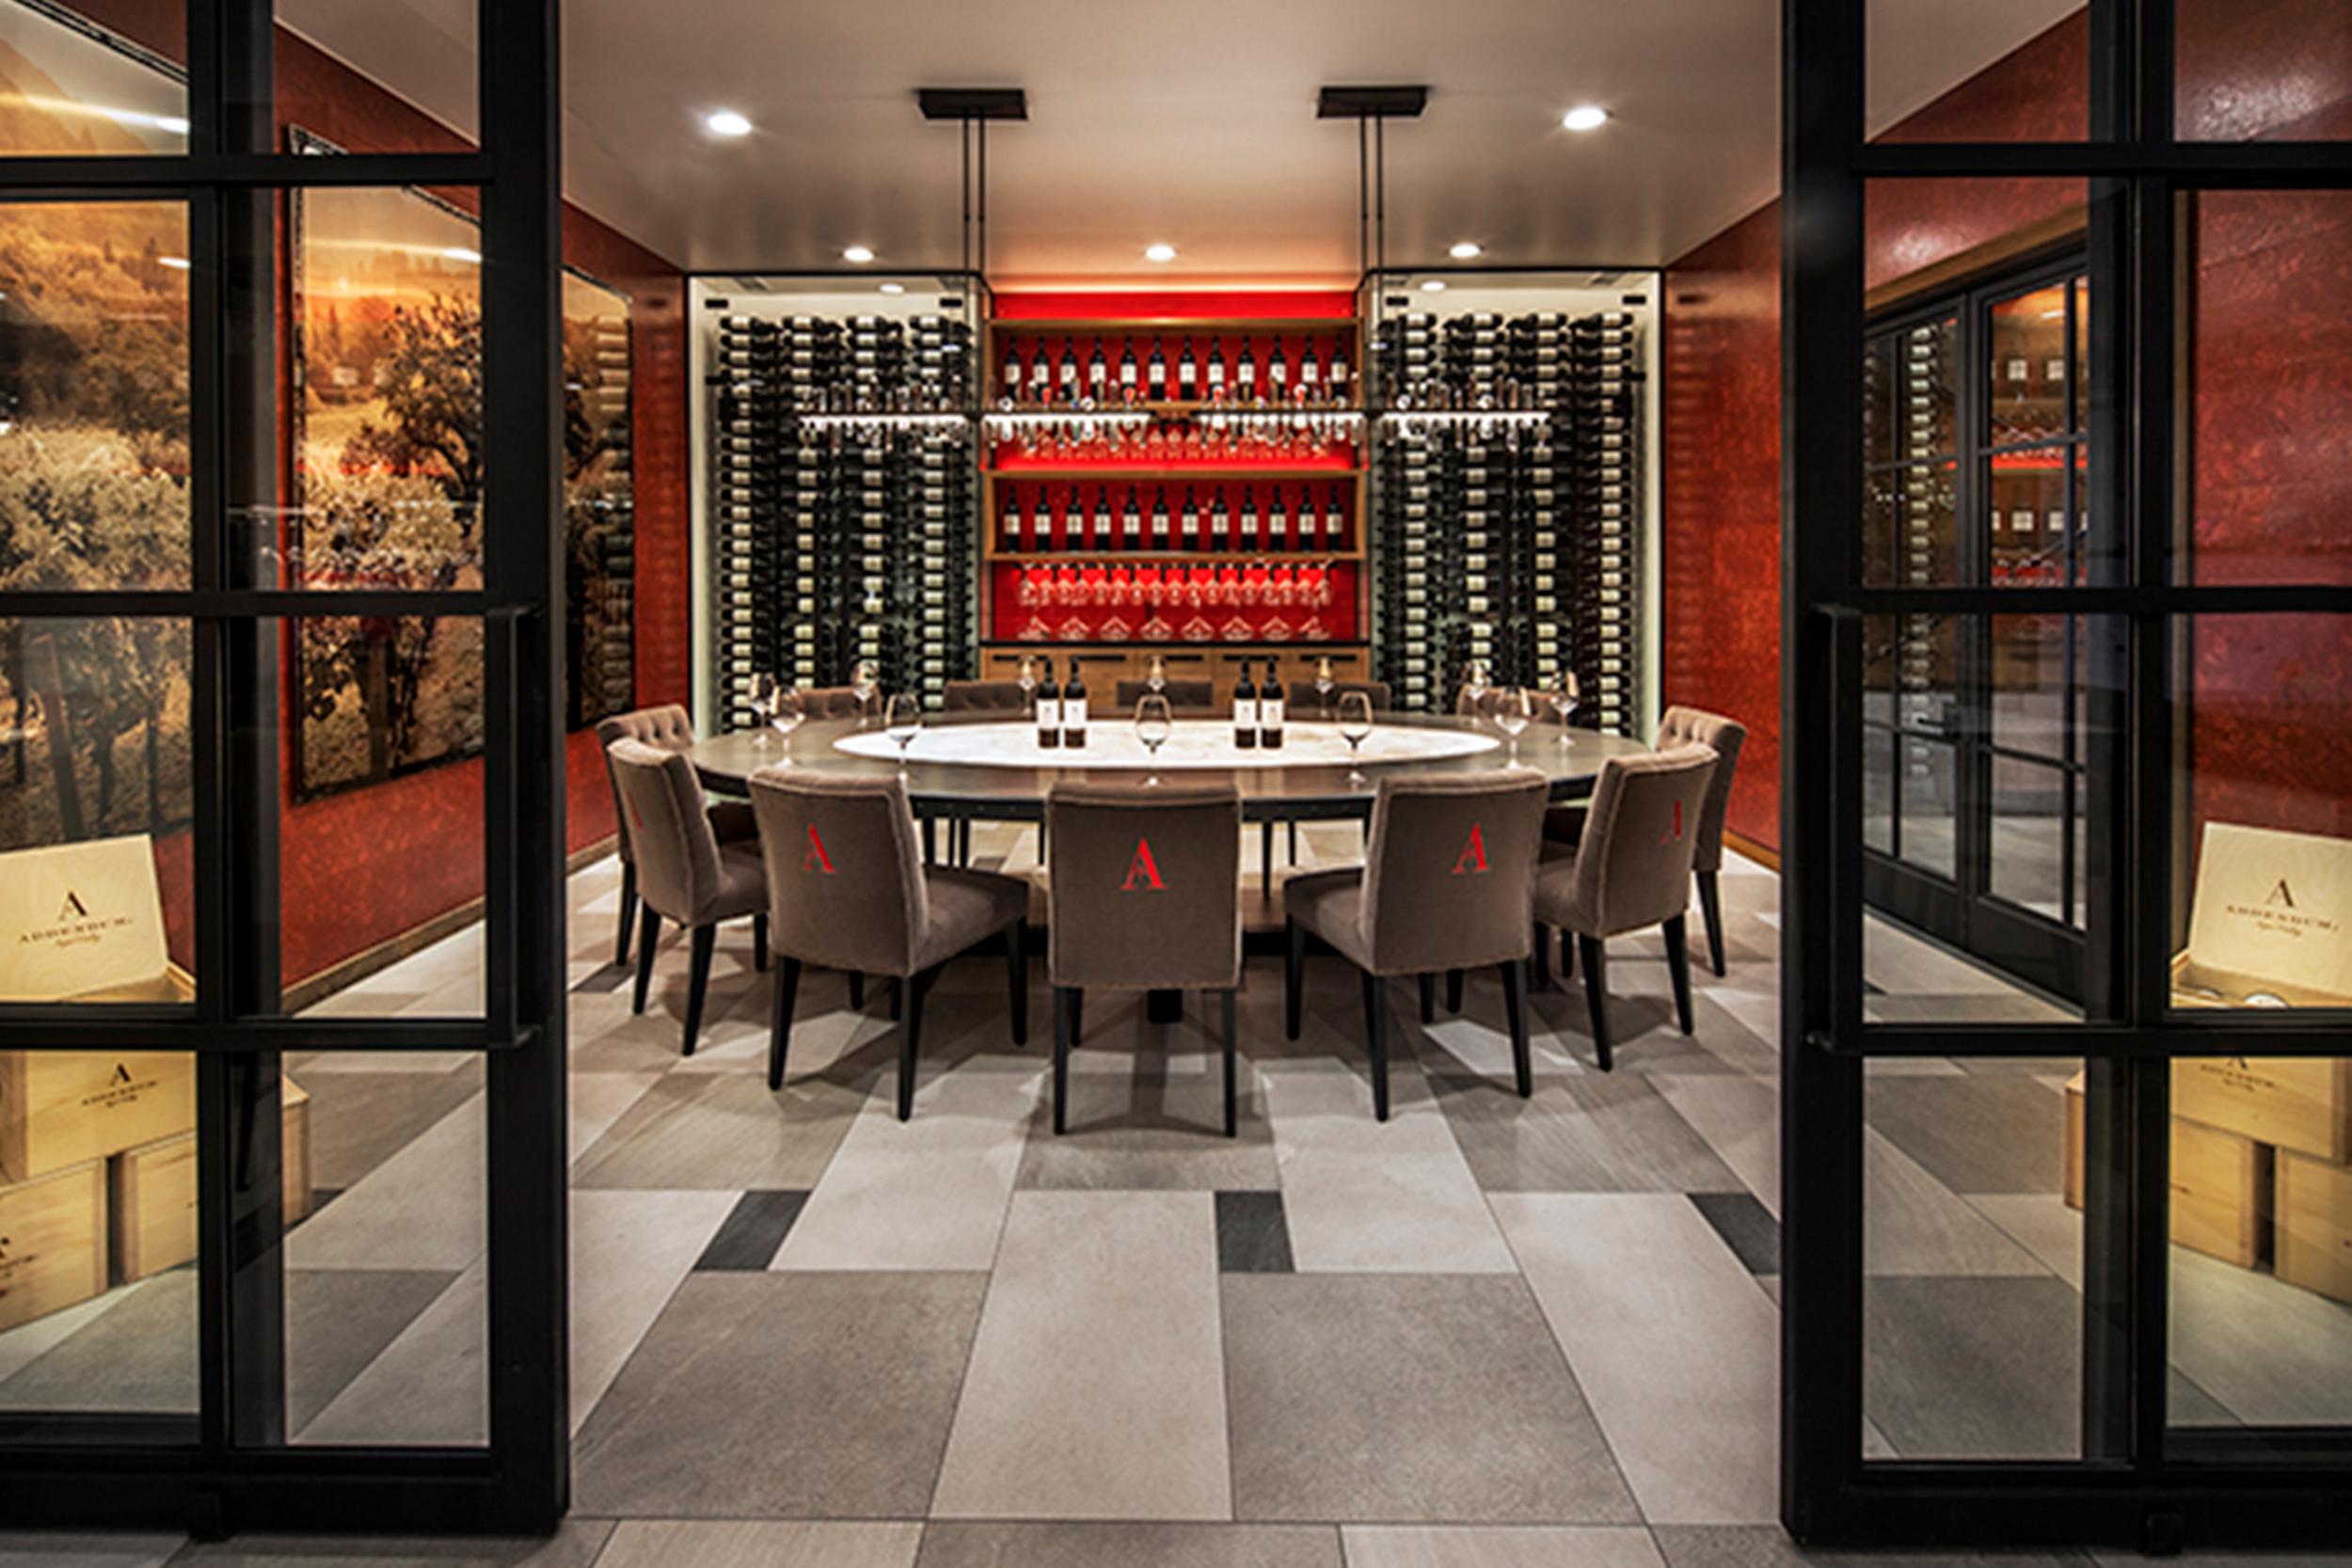 Tasting room_1.jpg